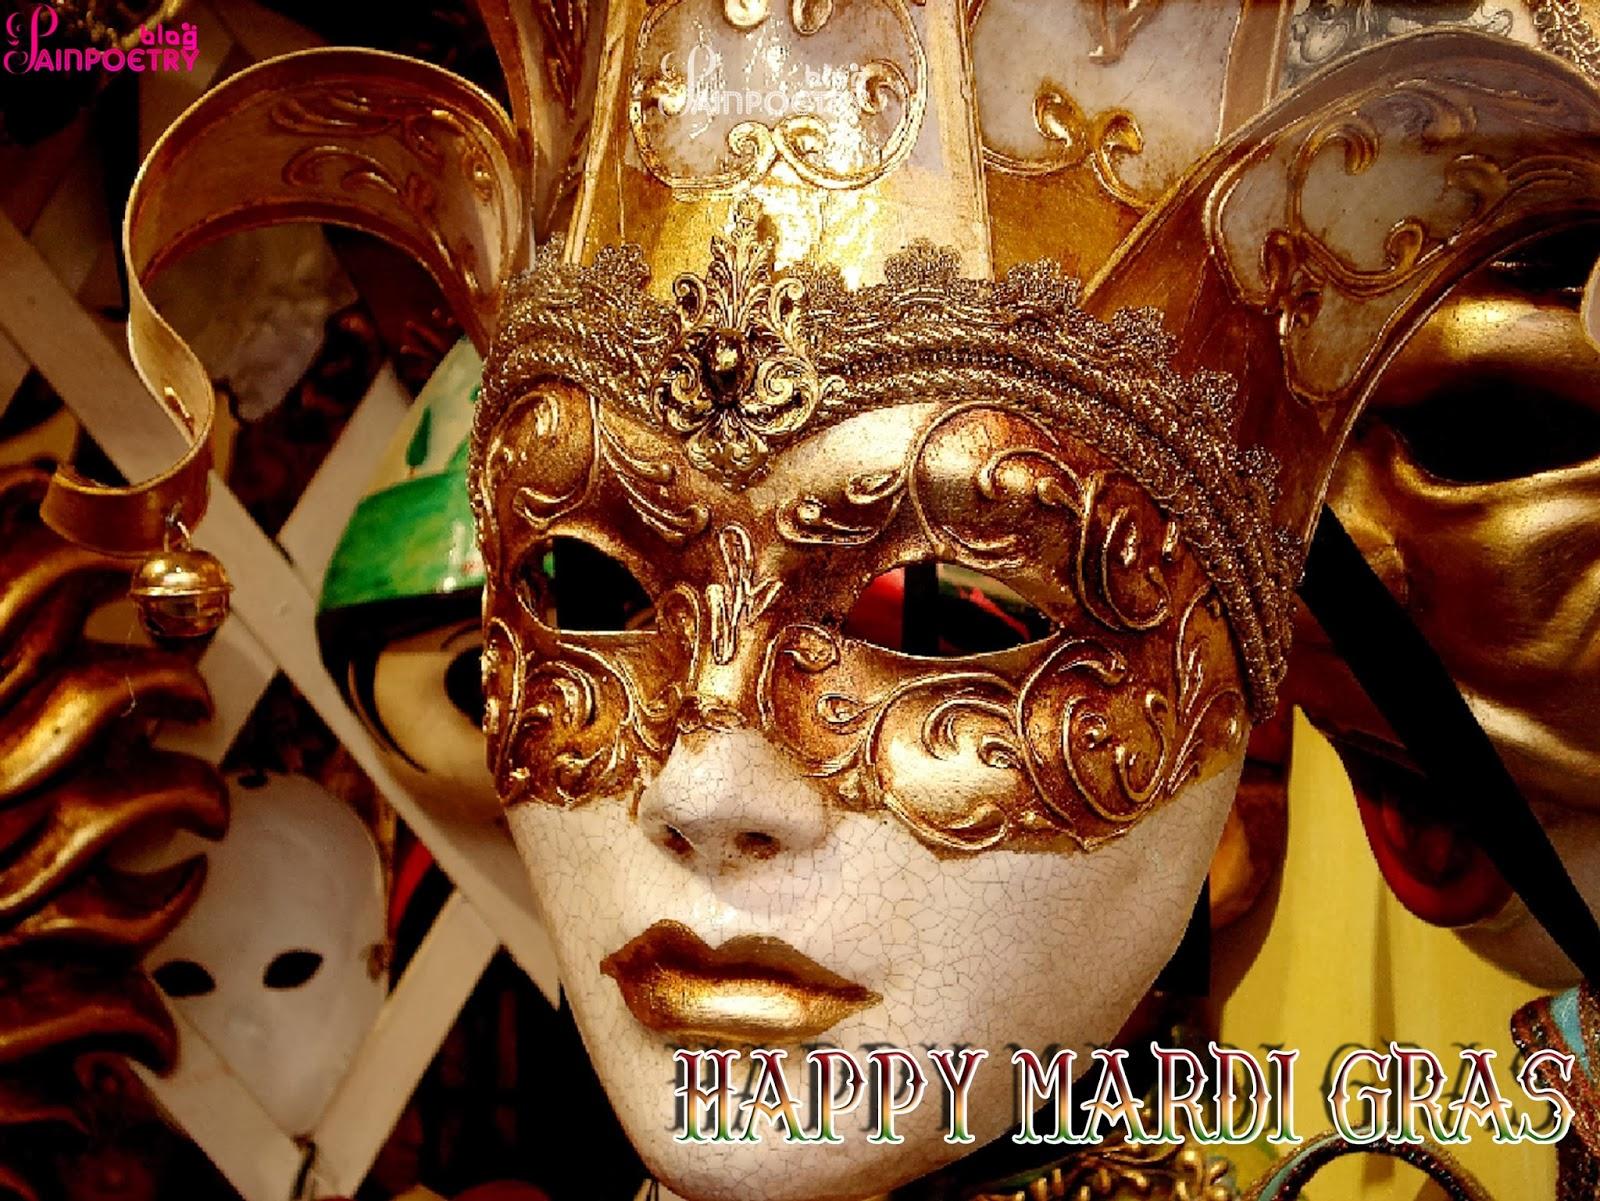 Happy-Mardi-Gras-Festival-Gold-Mask-Image-HD-Wide